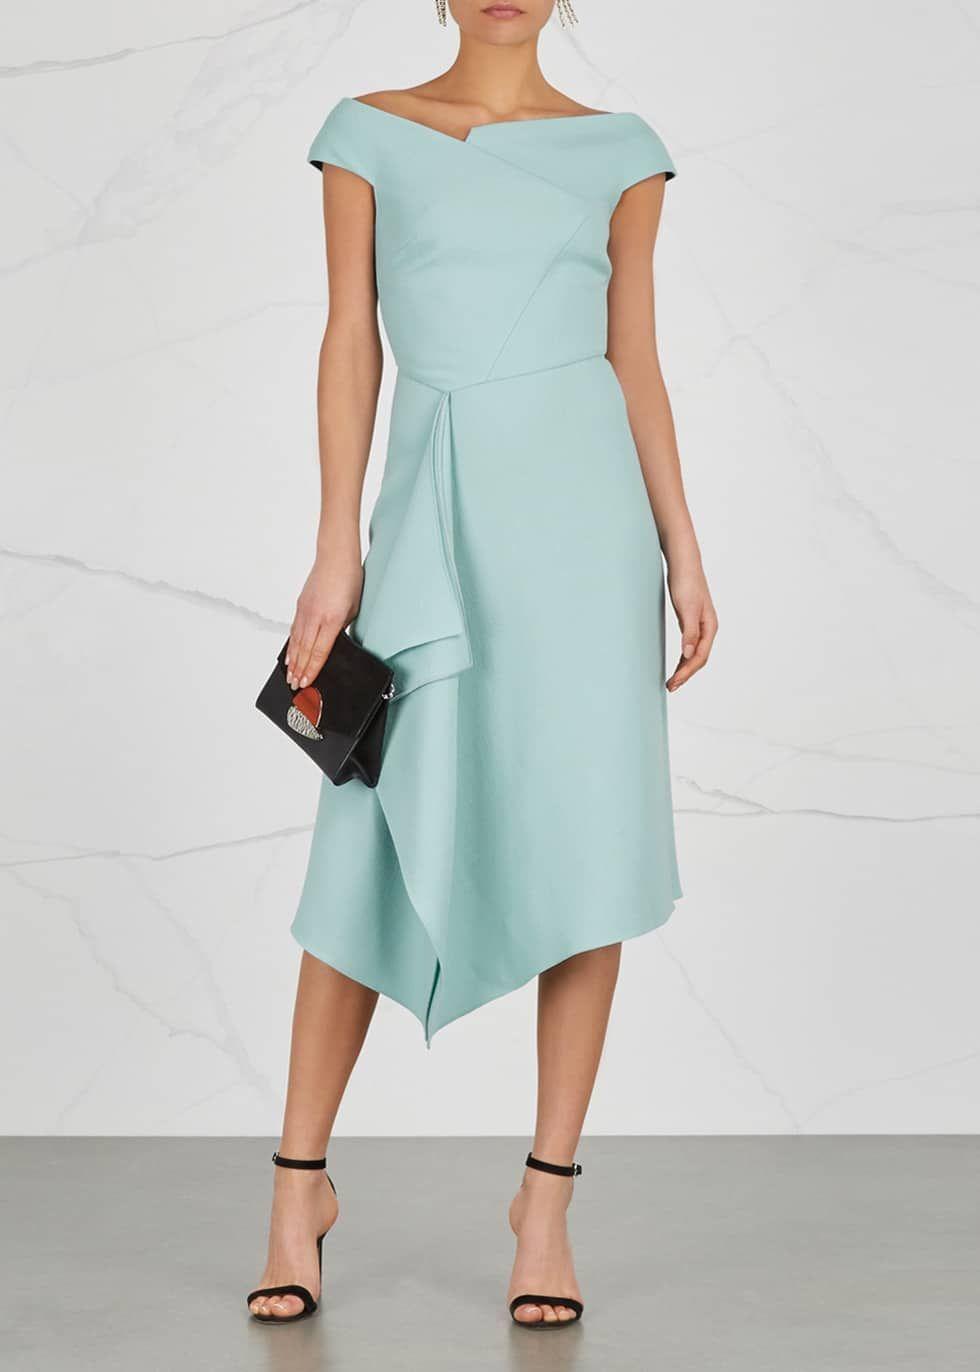 Image Result For Barwick Dress By Roland Mouret Dresses Select Dress Cotton Blends Dress [ 1372 x 980 Pixel ]